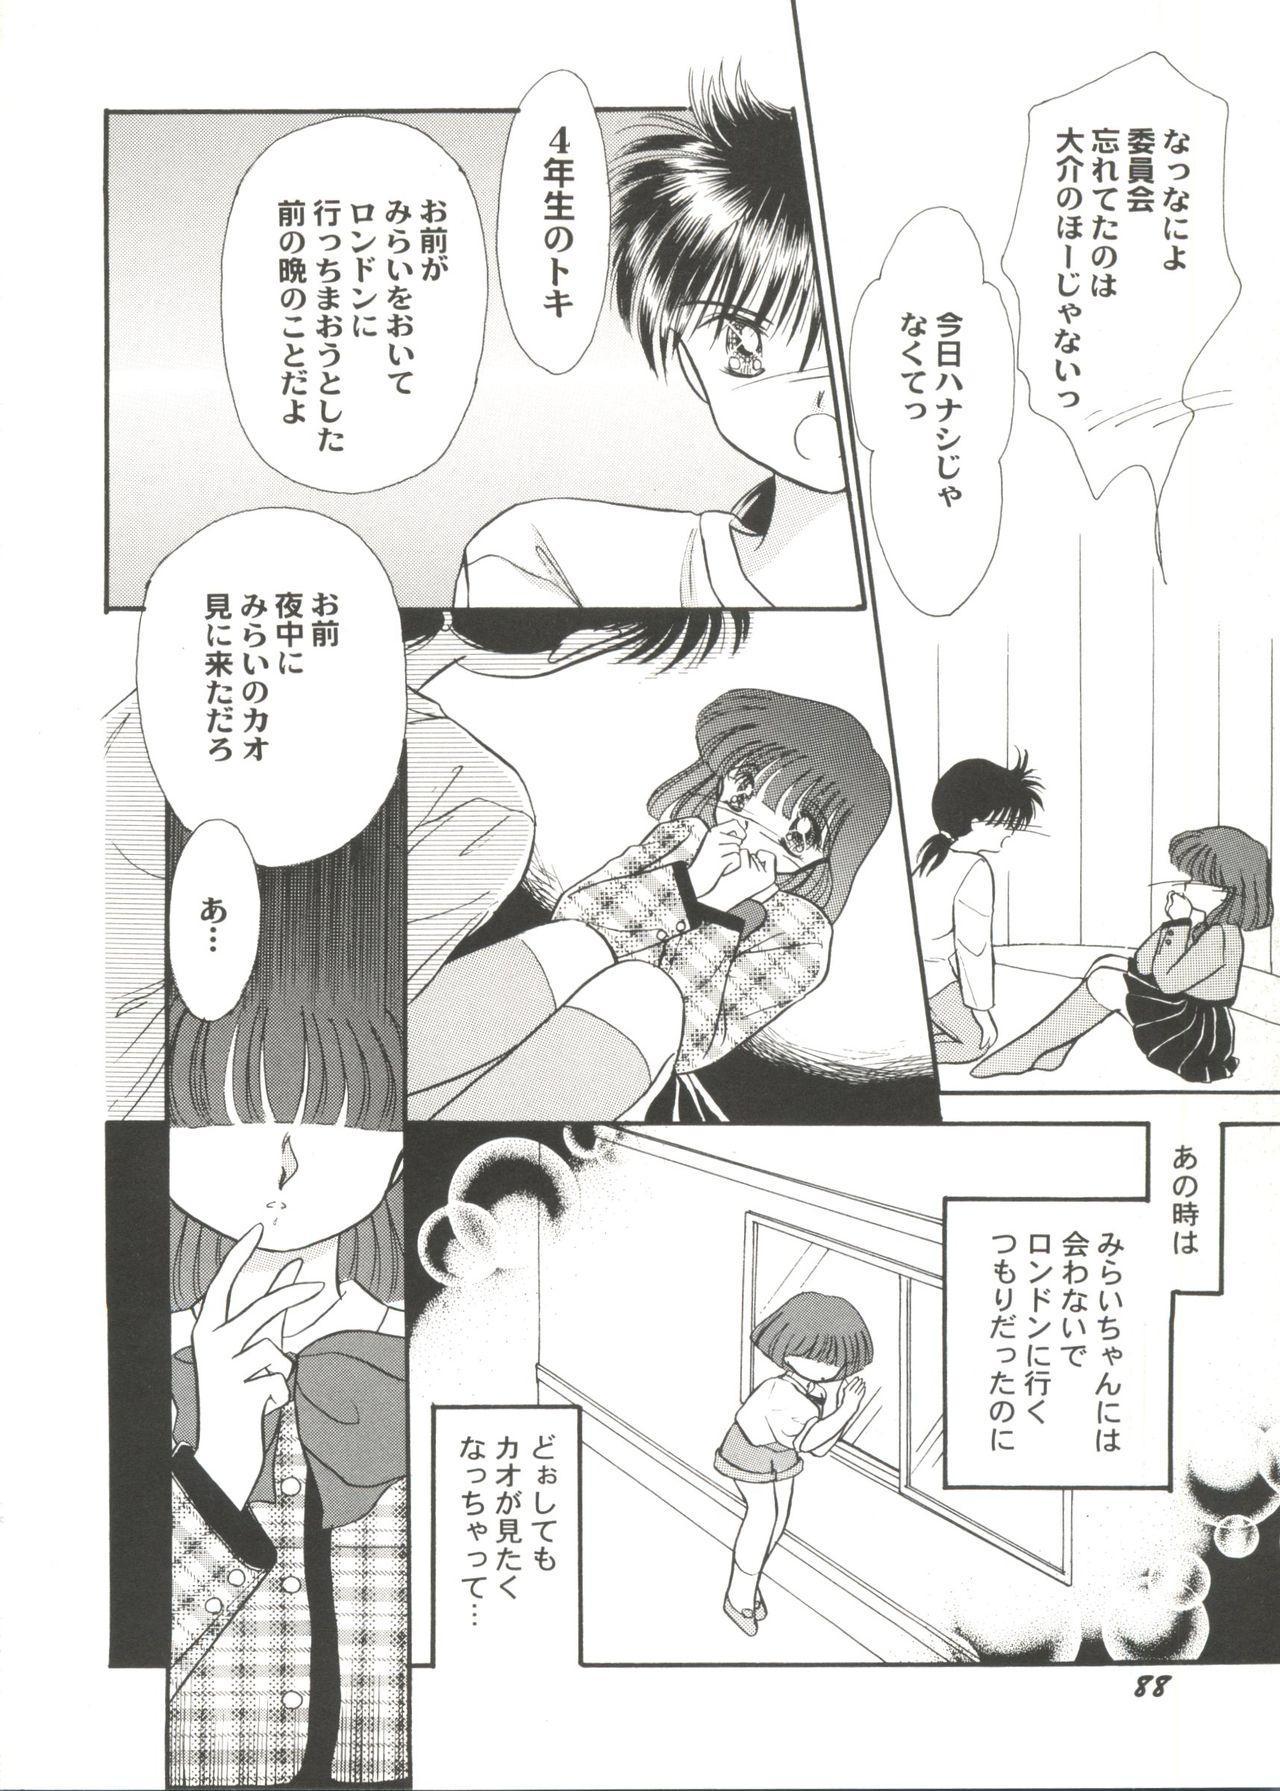 Bishoujo Doujin Peach Club - Pretty Gal's Fanzine Peach Club 9 89